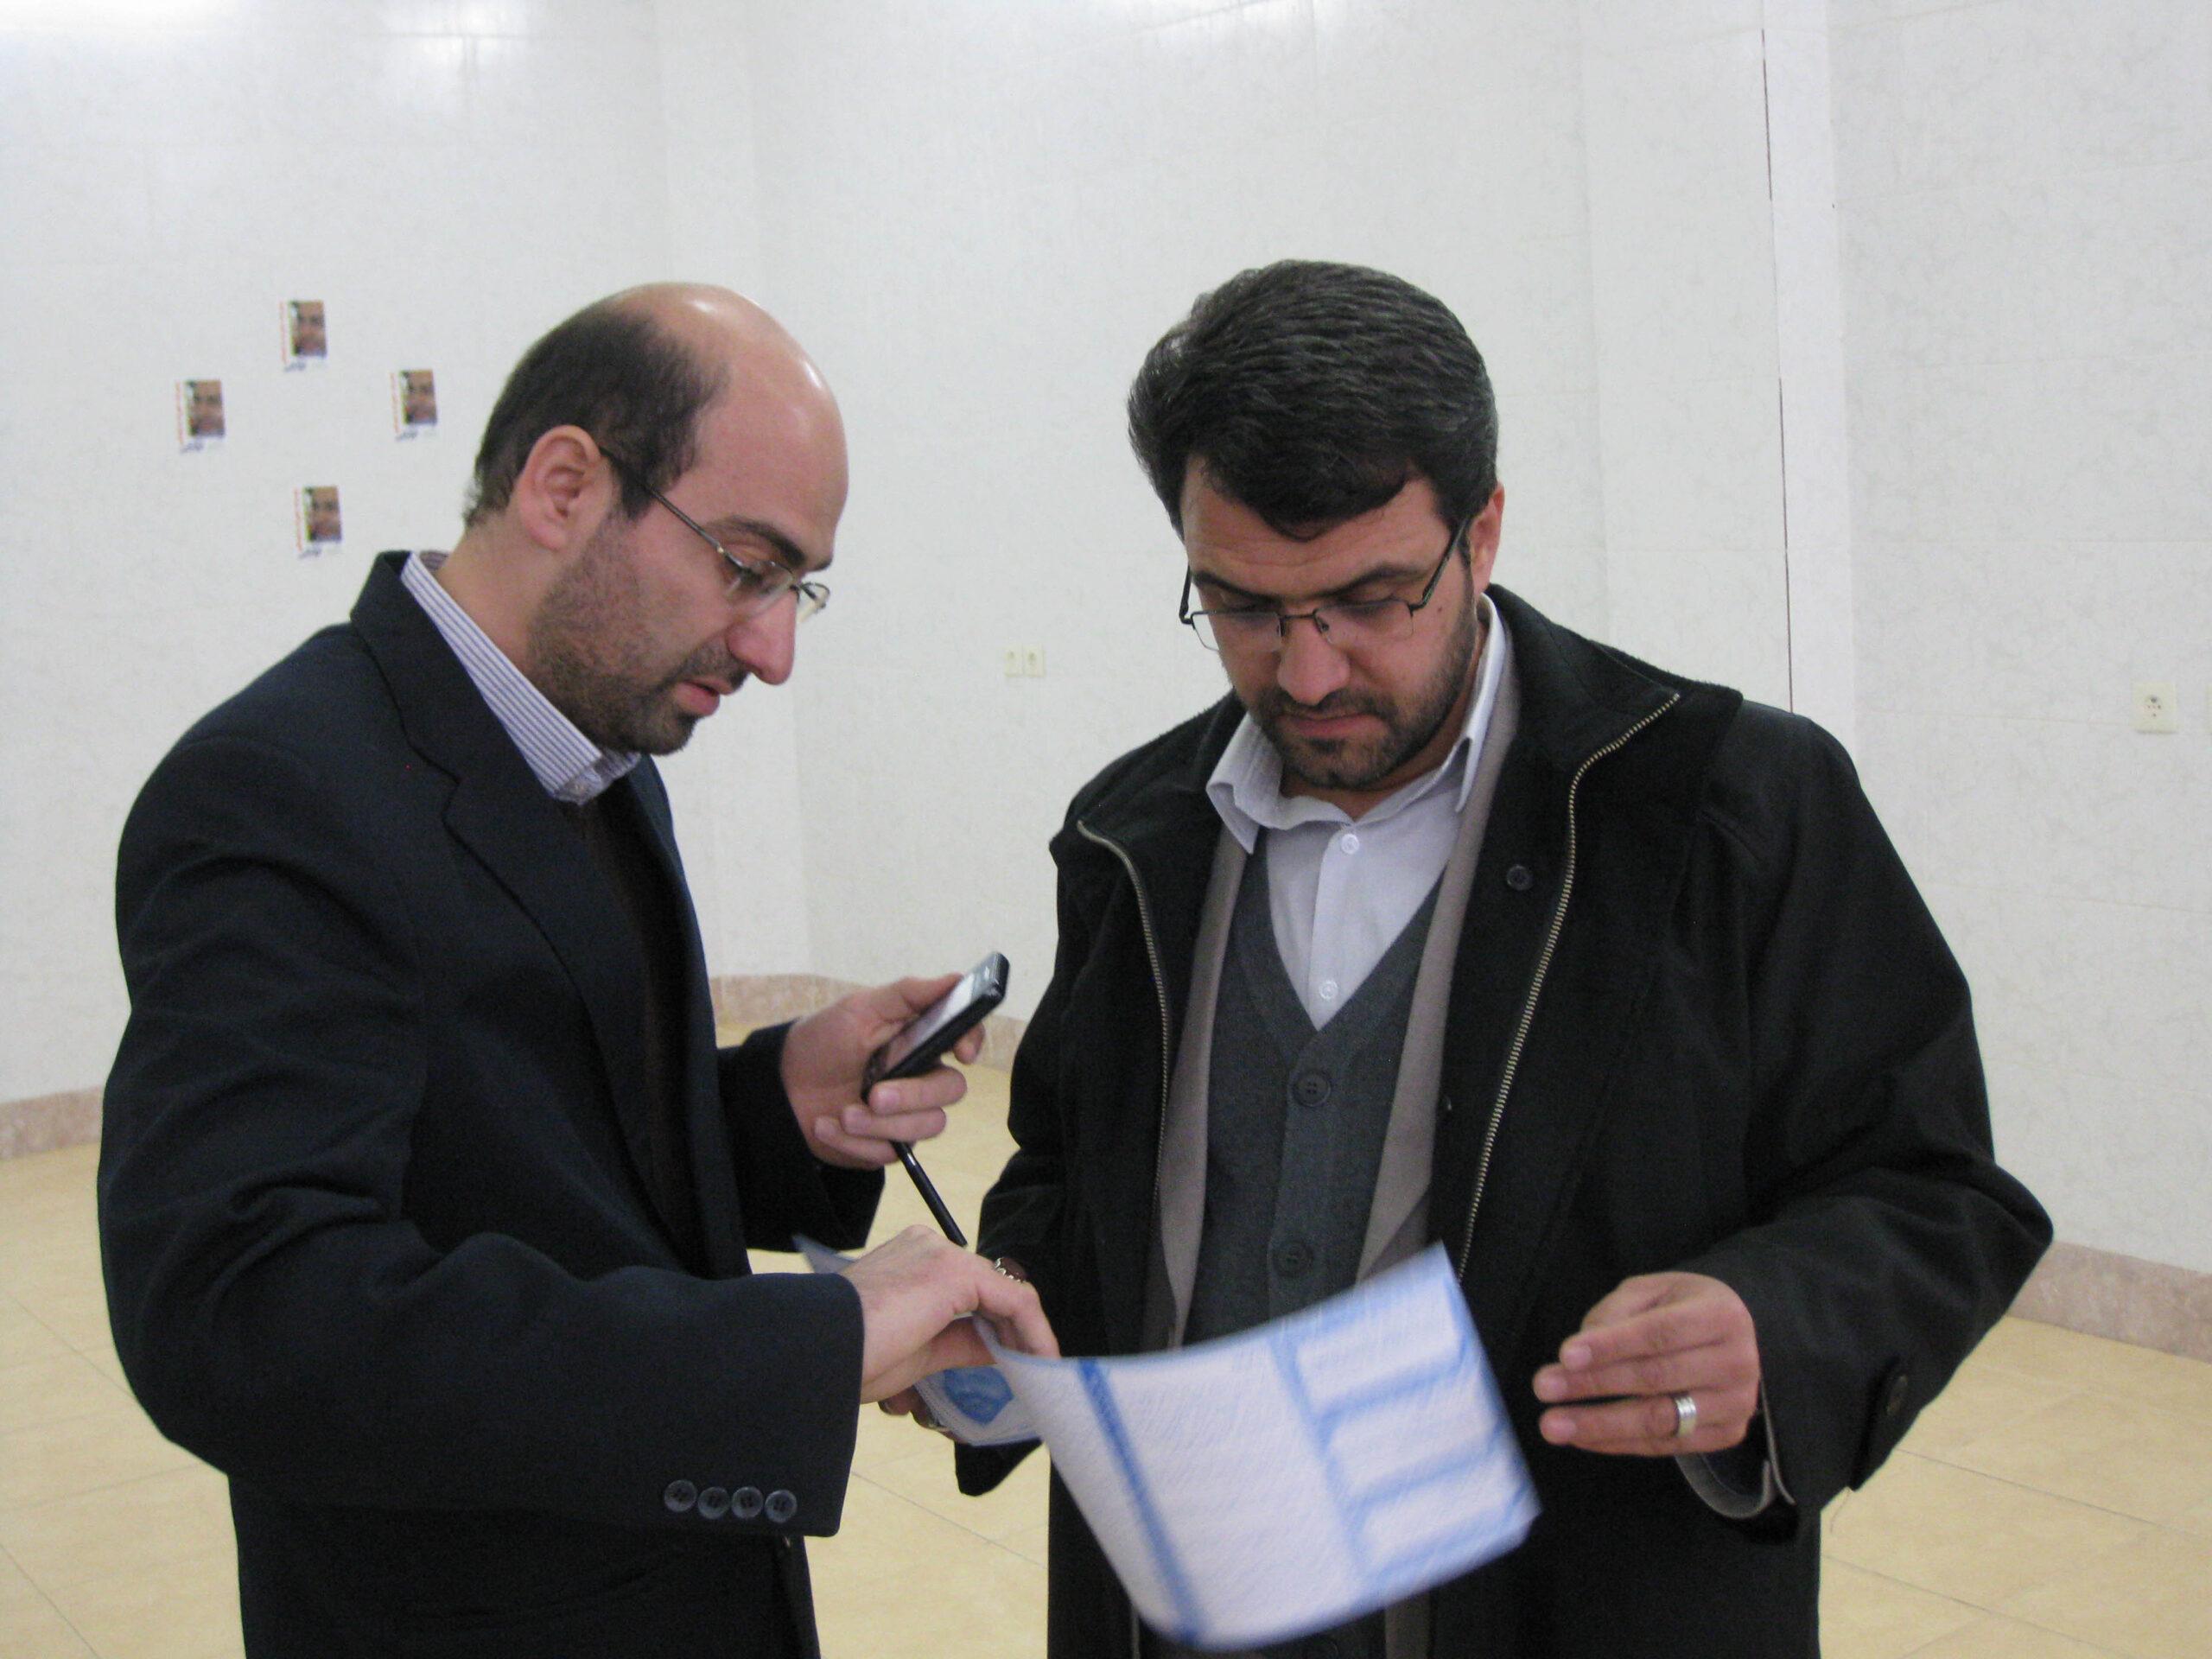 نتیجه انتخابات مجلس یازدهم در نجف آباد نتیجه انتخابات مجلس یازدهم در نجف آباد نتیجه انتخابات مجلس یازدهم در نجف آباد                                  9 1 scaled